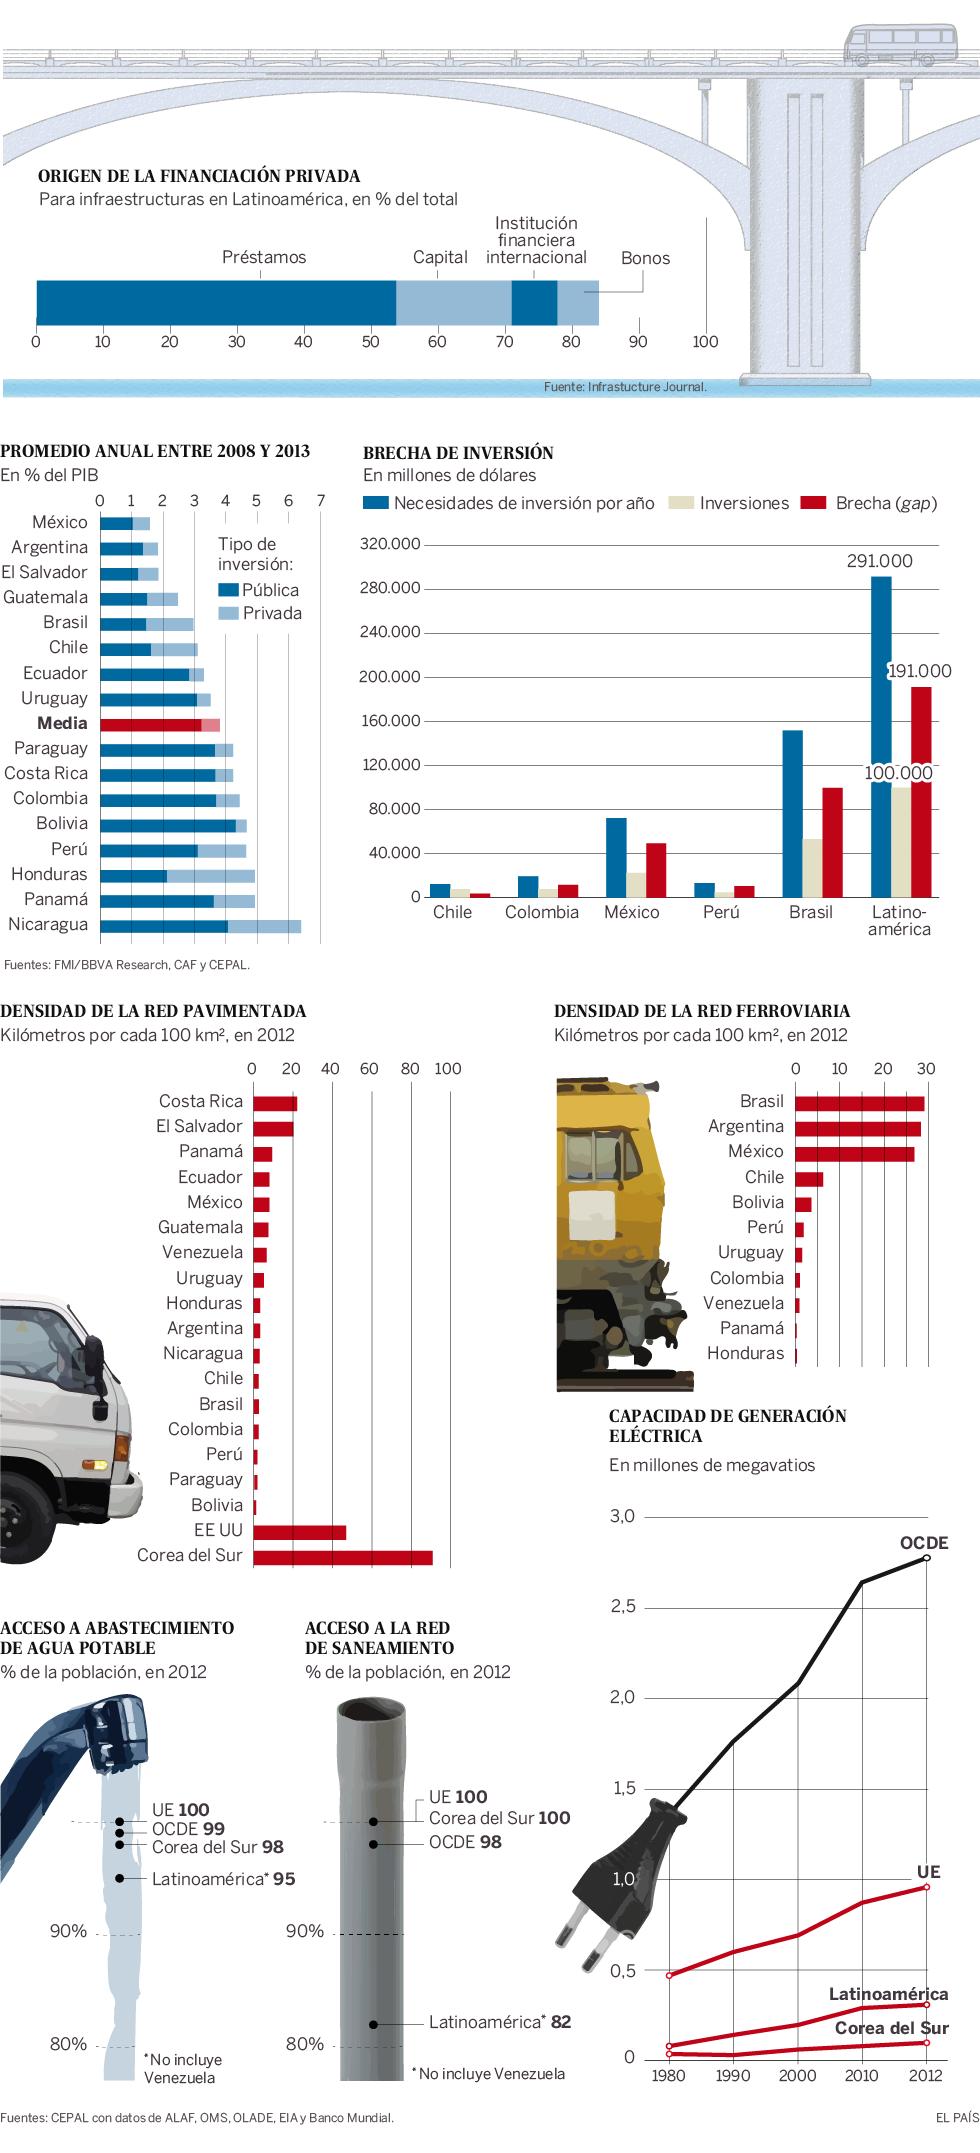 Inversión en infraestructuras en Latinoamérica